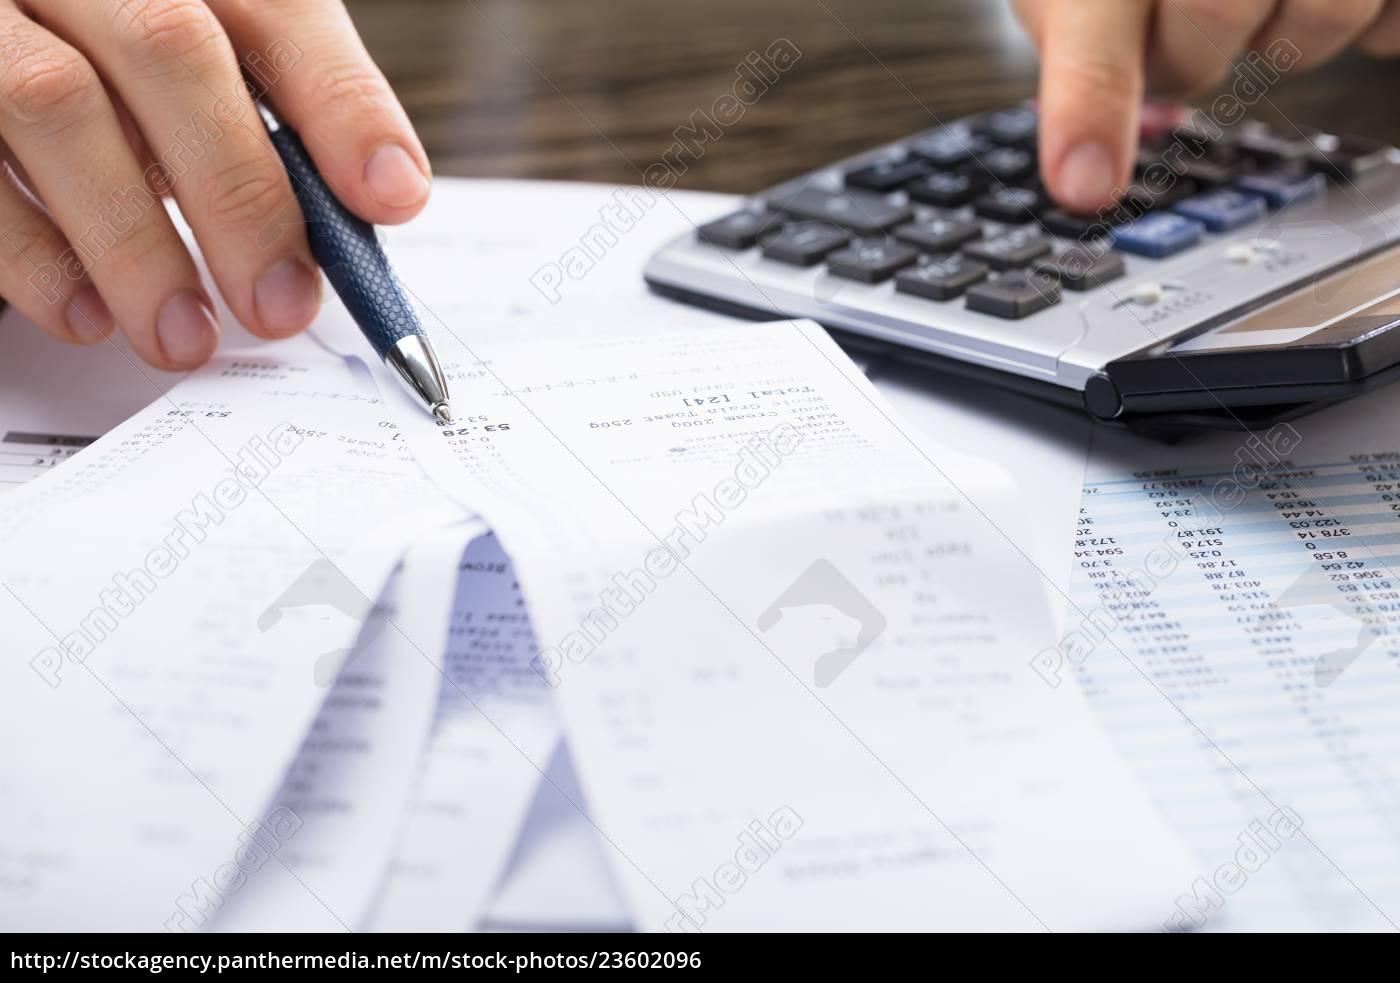 businessperson, calculating, receipt - 23602096